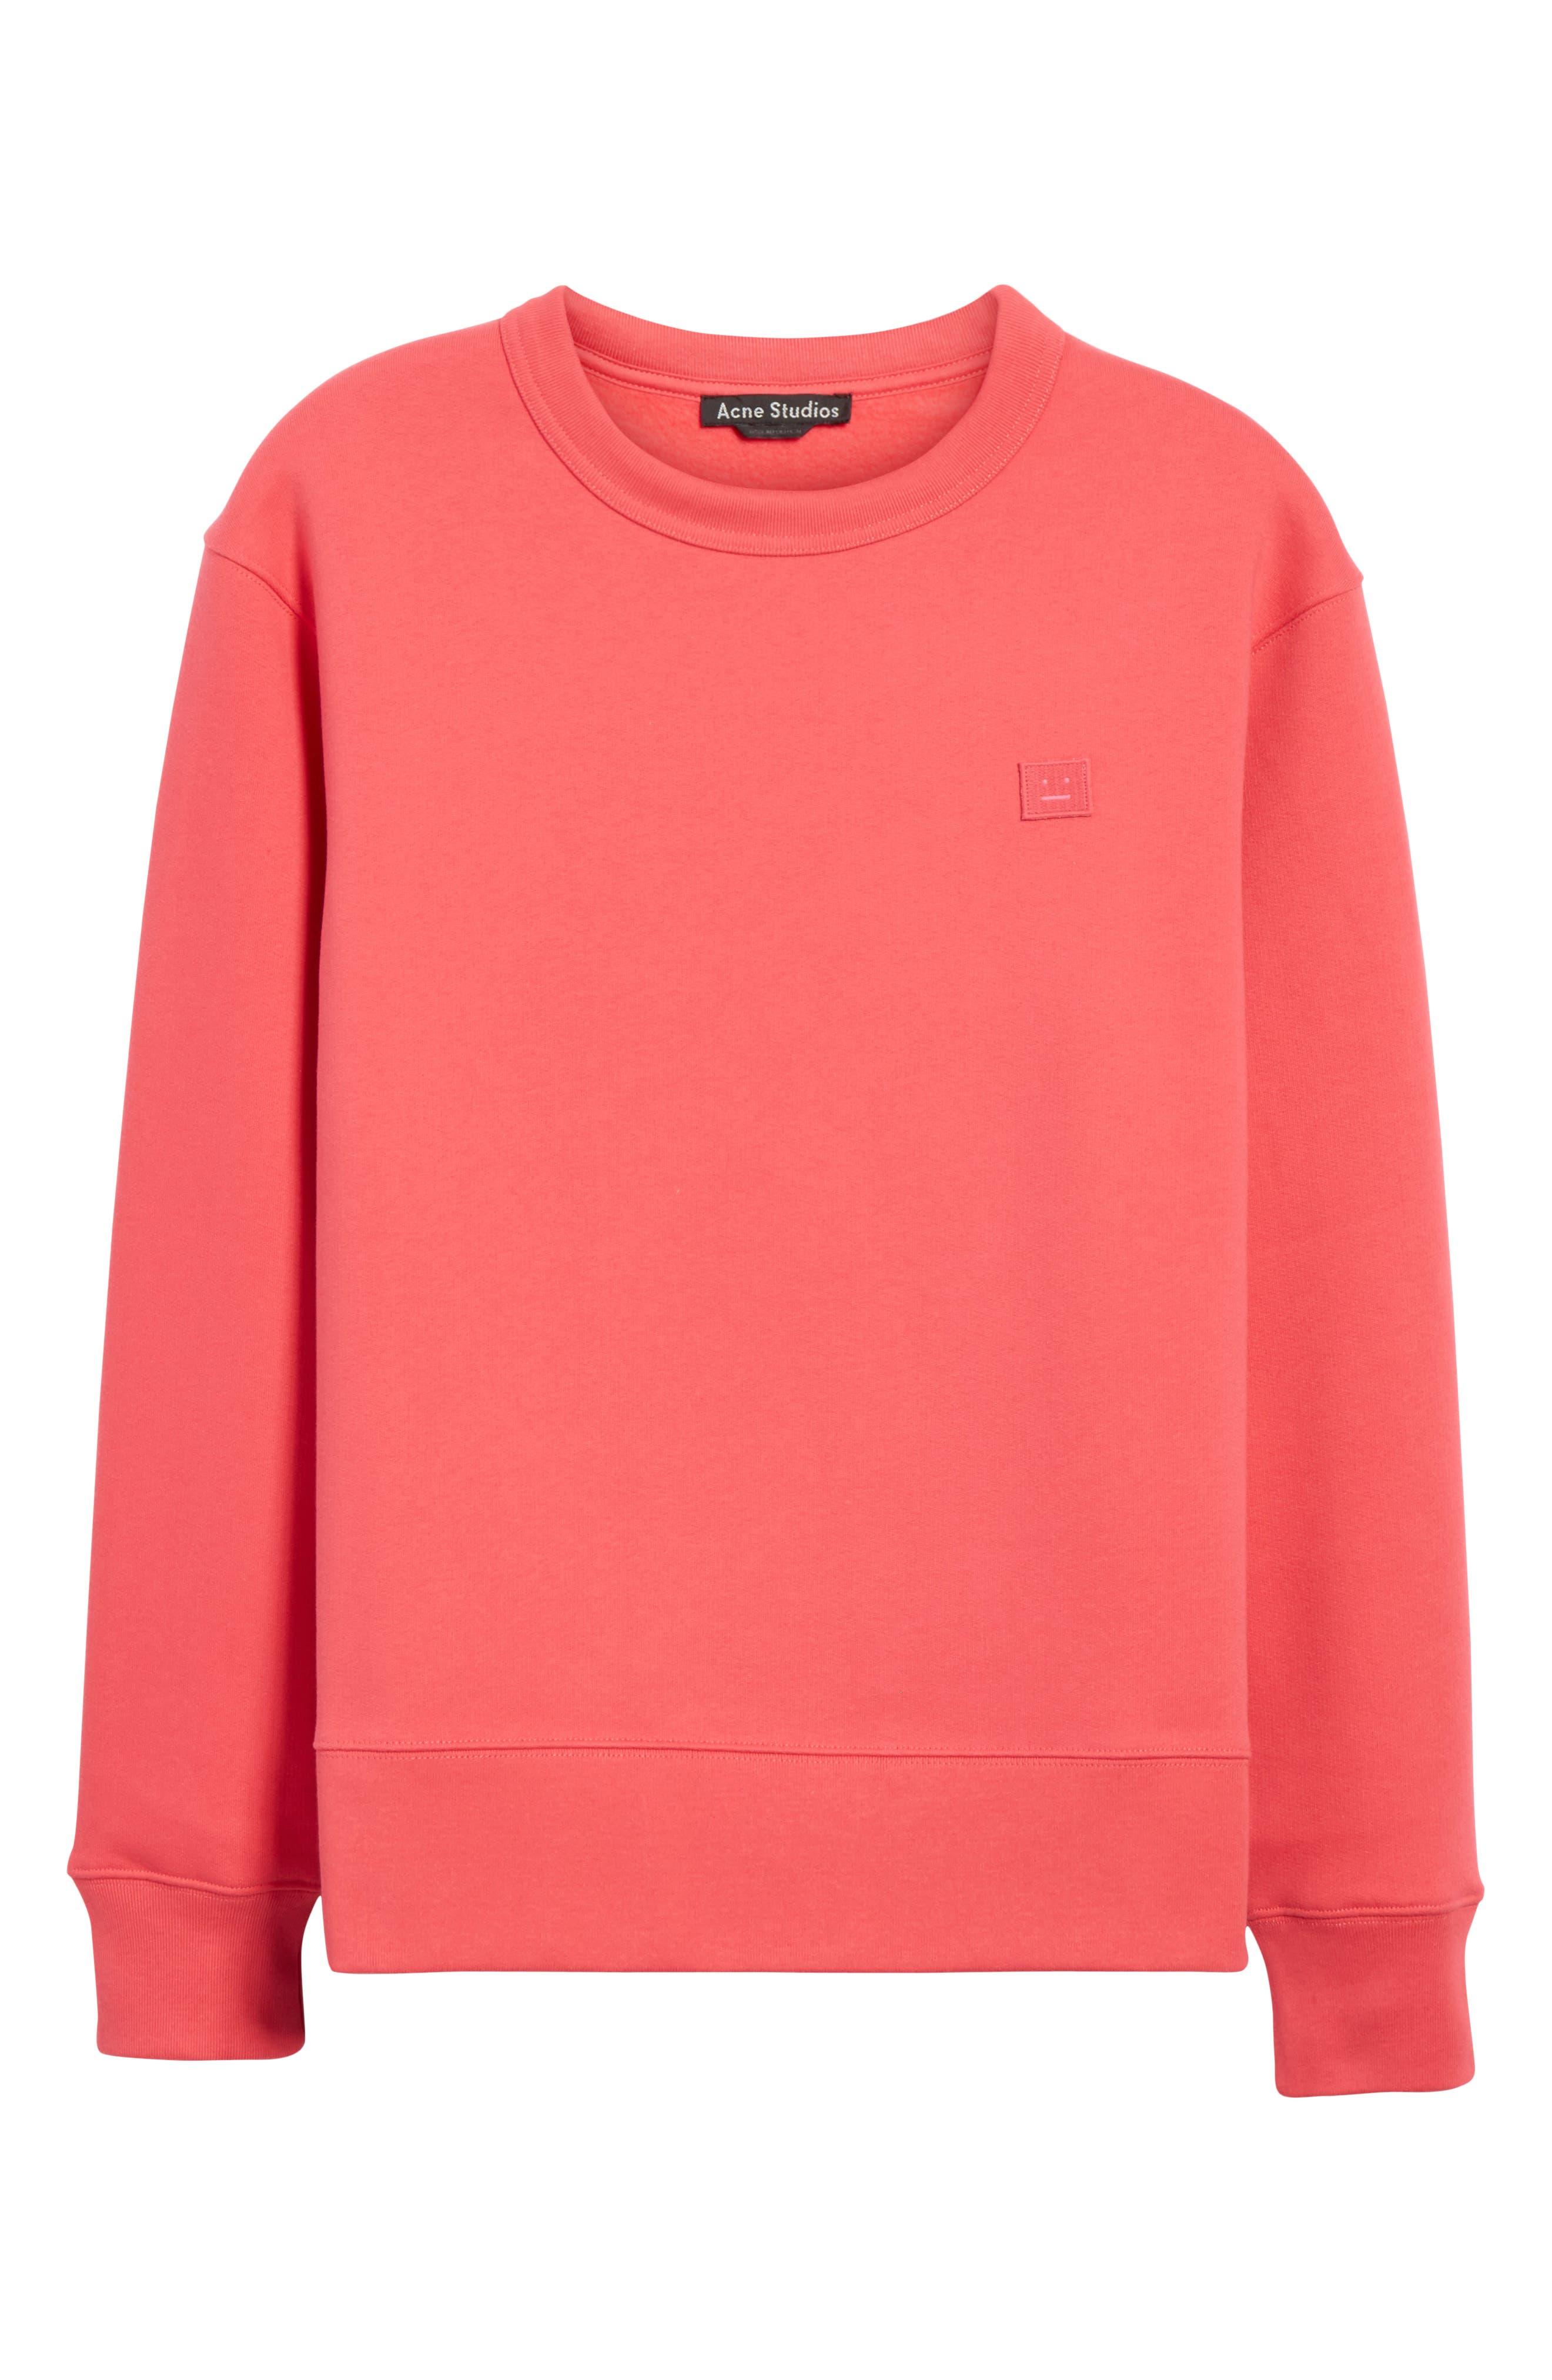 Fairview Crewneck Sweatshirt,                             Alternate thumbnail 7, color,                             Neon Pink